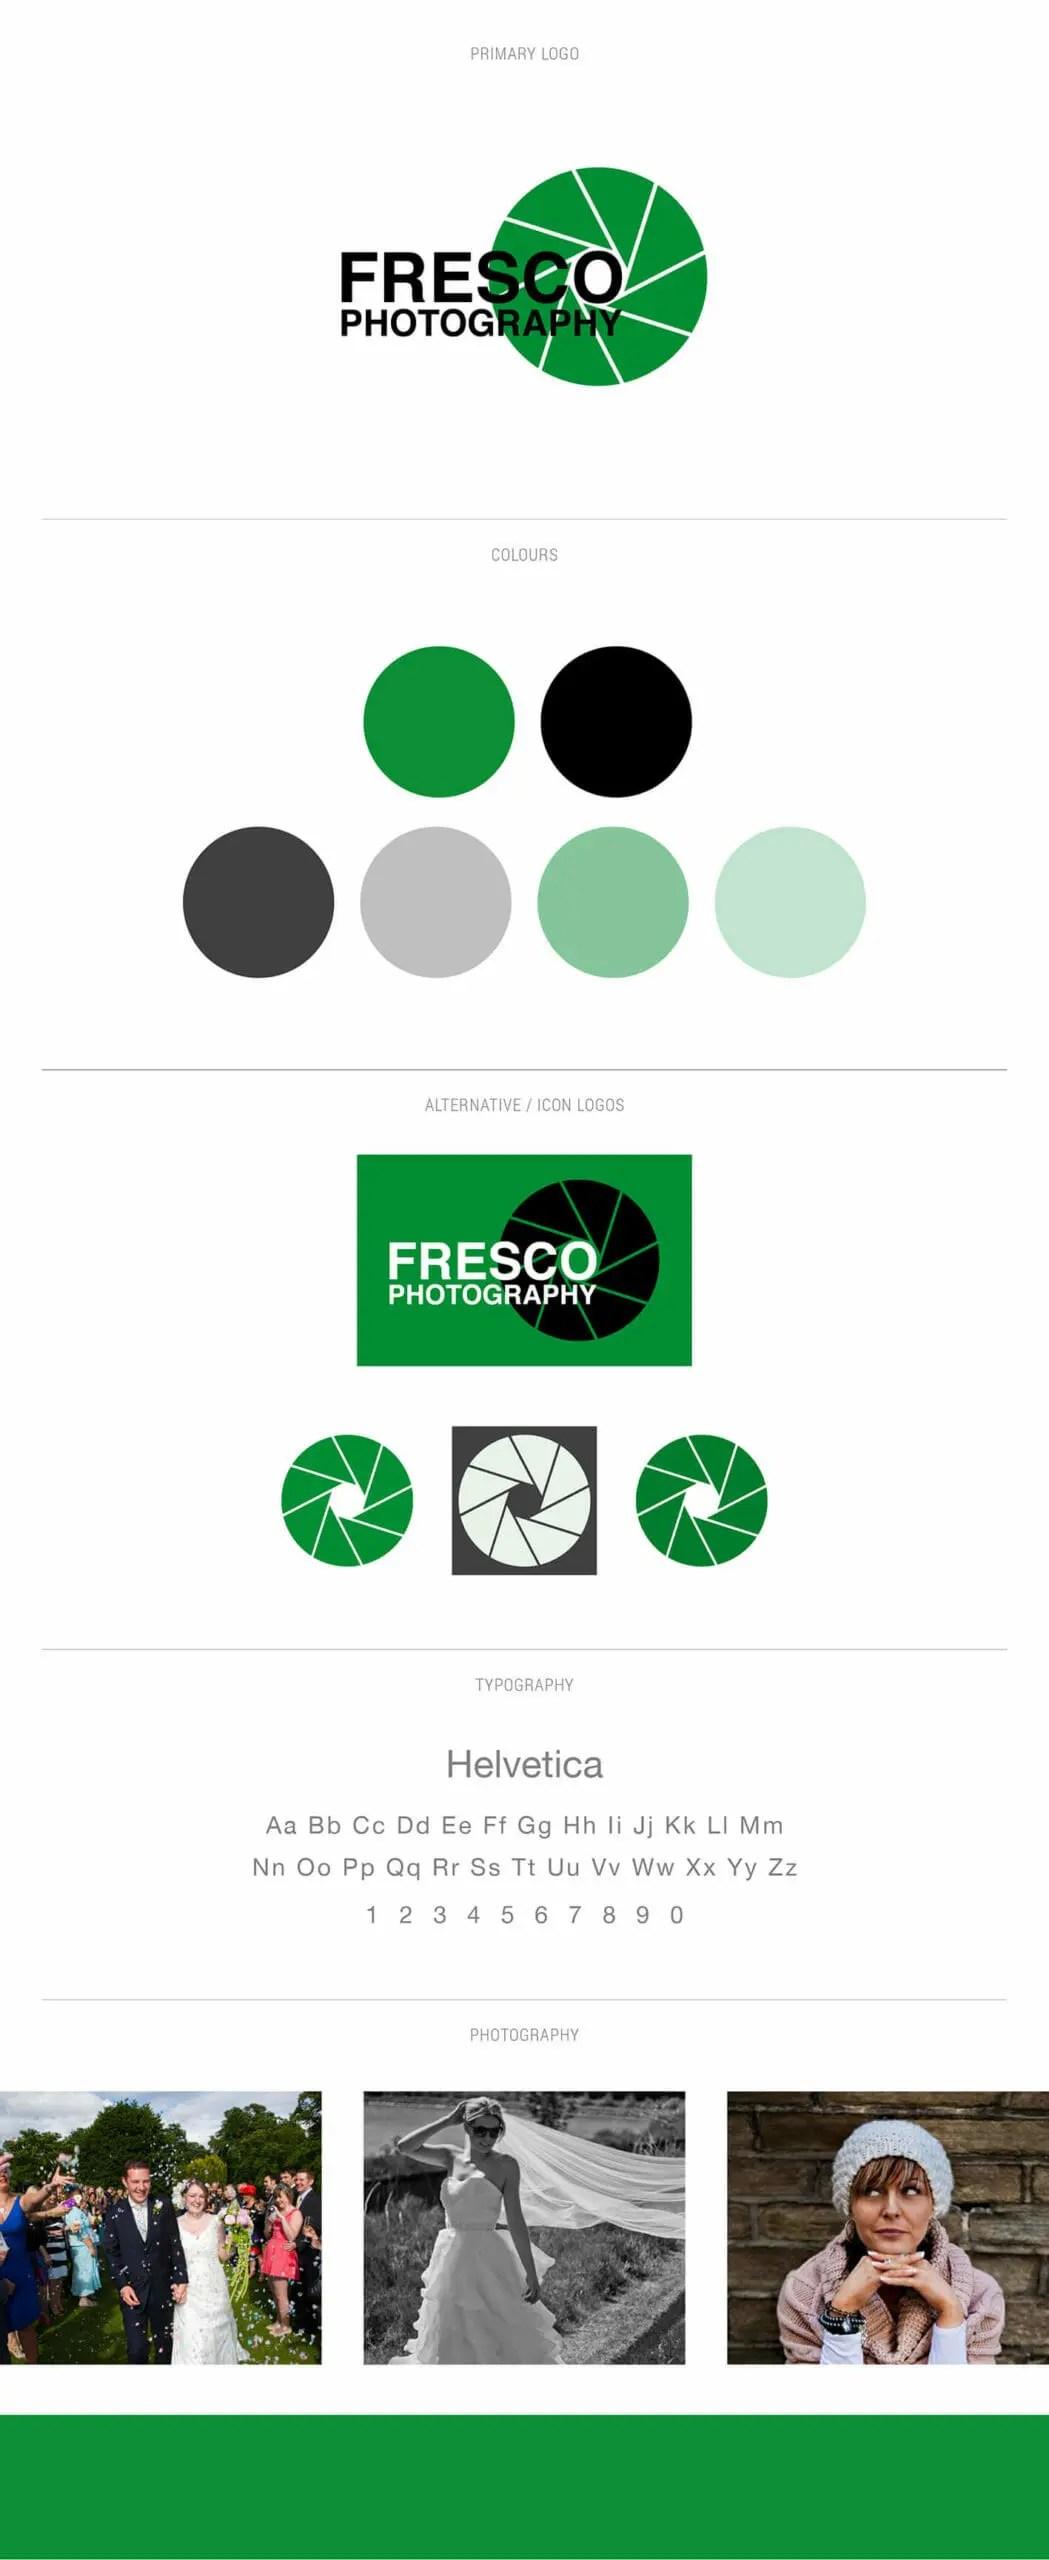 Fresco Photography brand board.